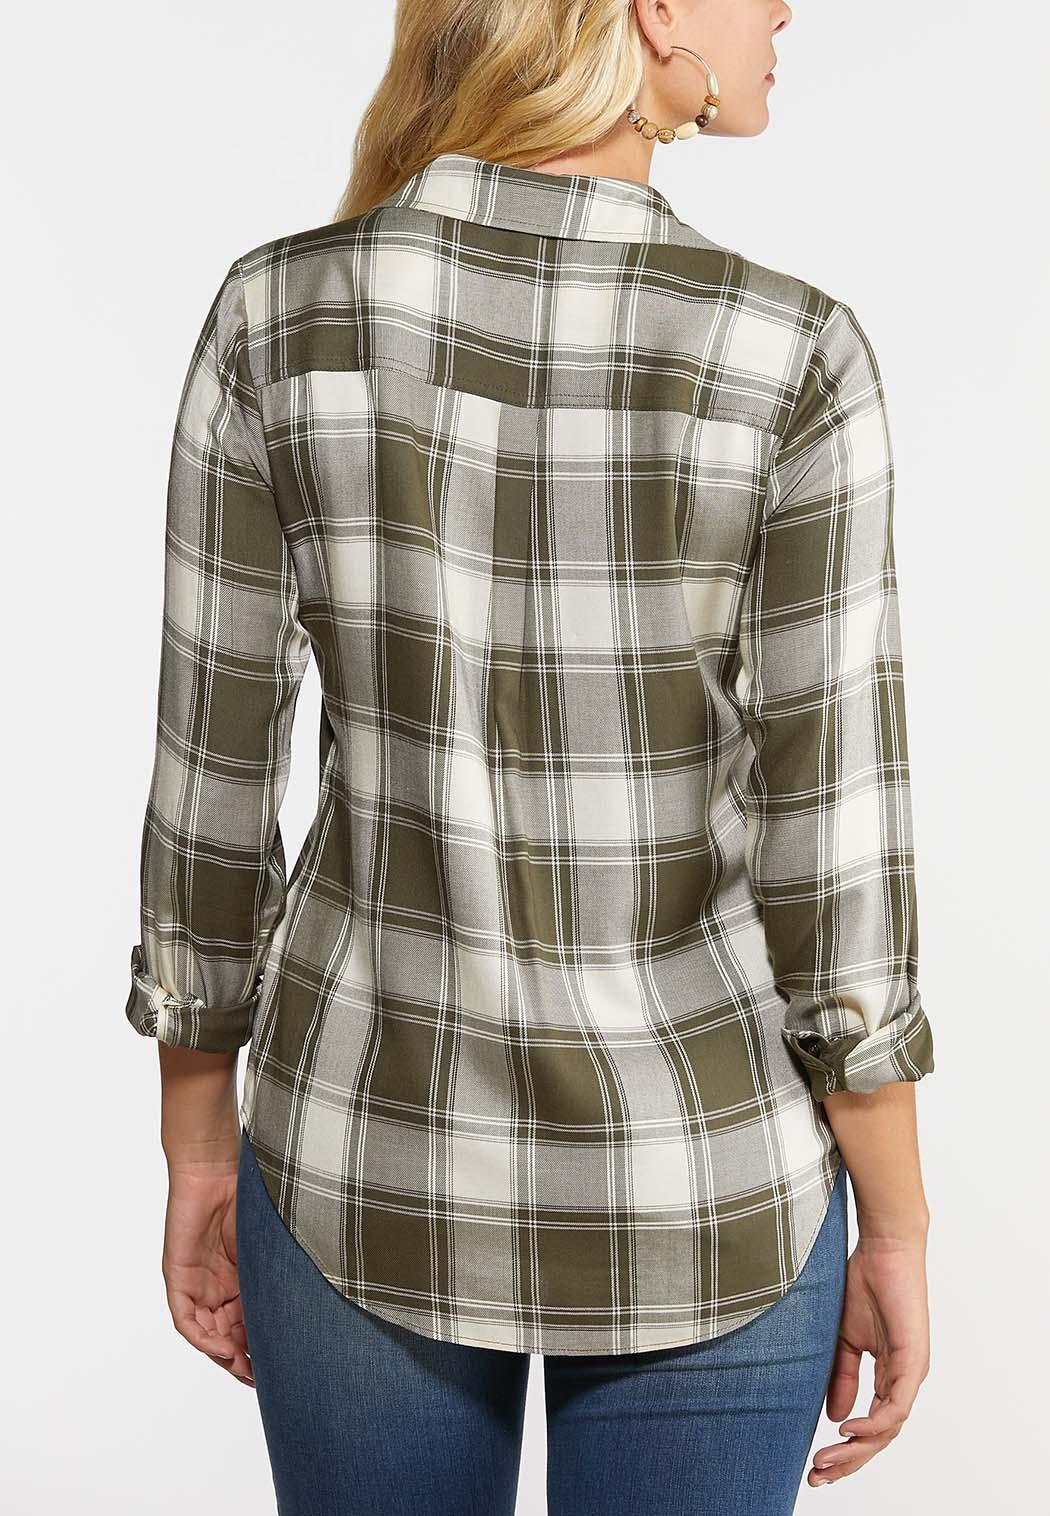 Olive Plaid High-Low Shirt (Item #44359184)